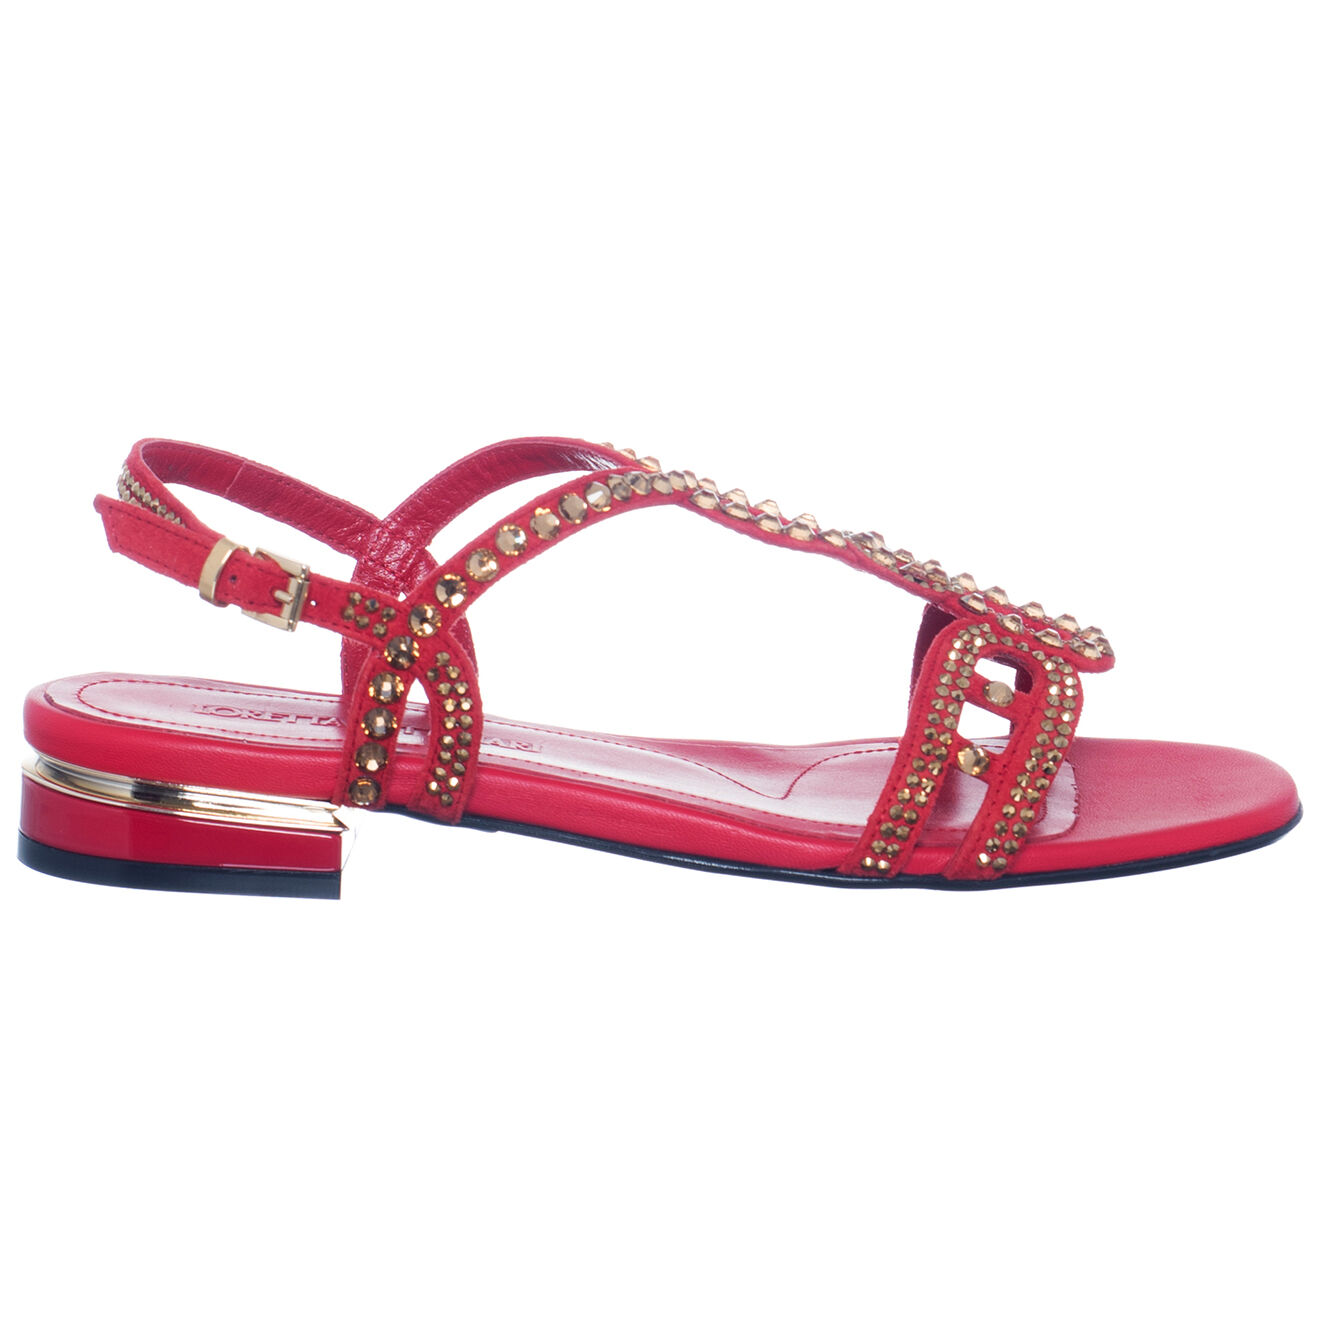 Sandales en Cuir Cassis rouges - Loretta Pettinari - Modalova